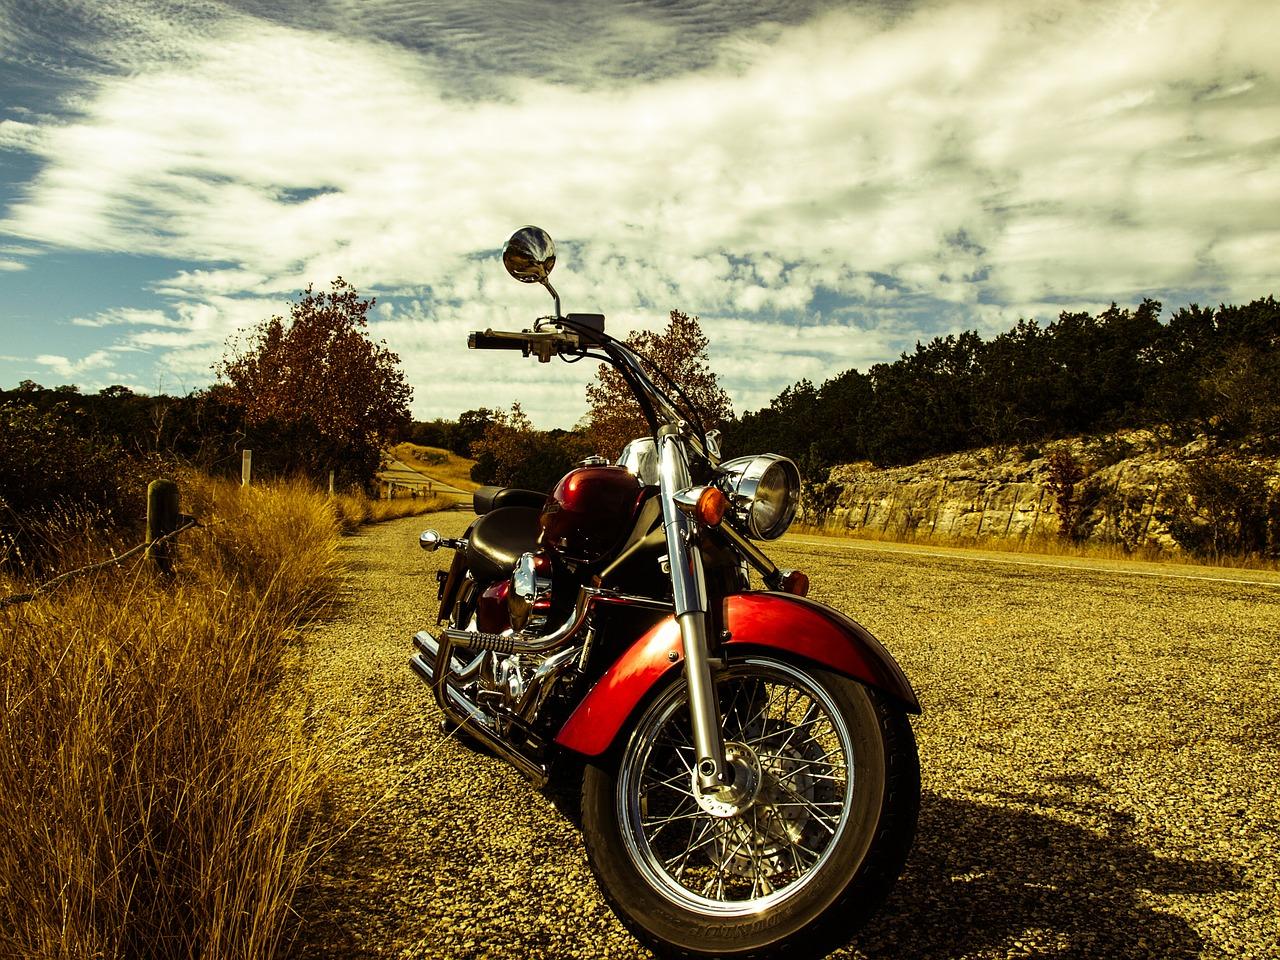 motorbike-red-rural